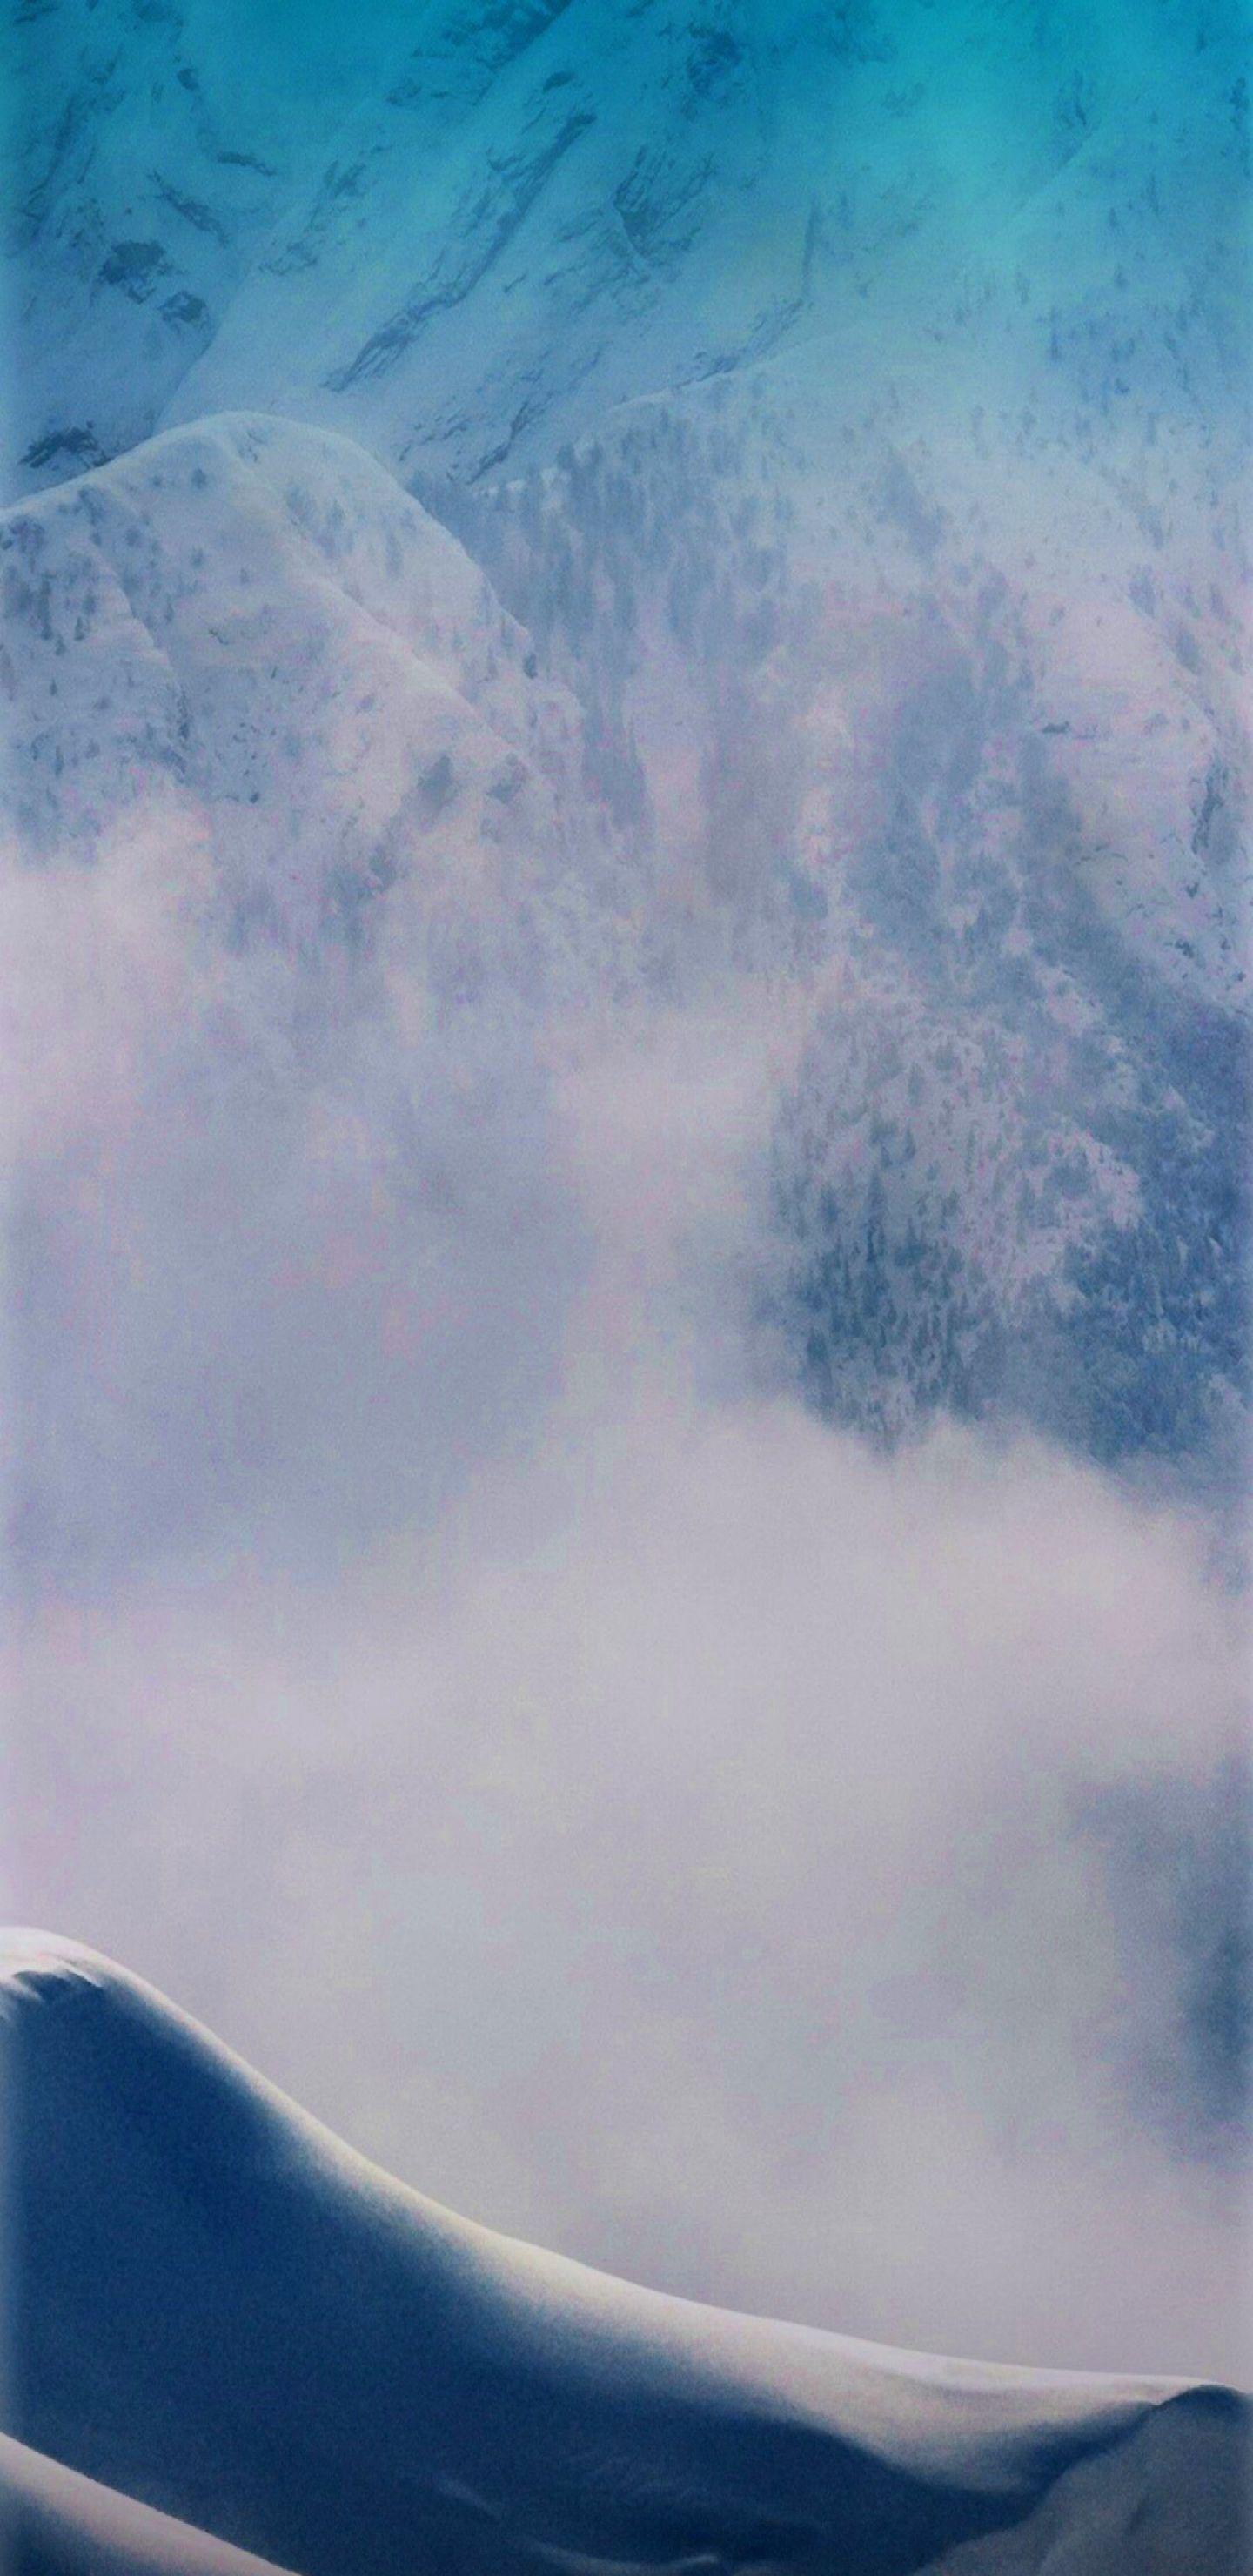 Mountain aqua wallpaper galaxy tranquil beauty nature peaceful calming clouds sky s8 - Galaxy cloud wallpaper ...